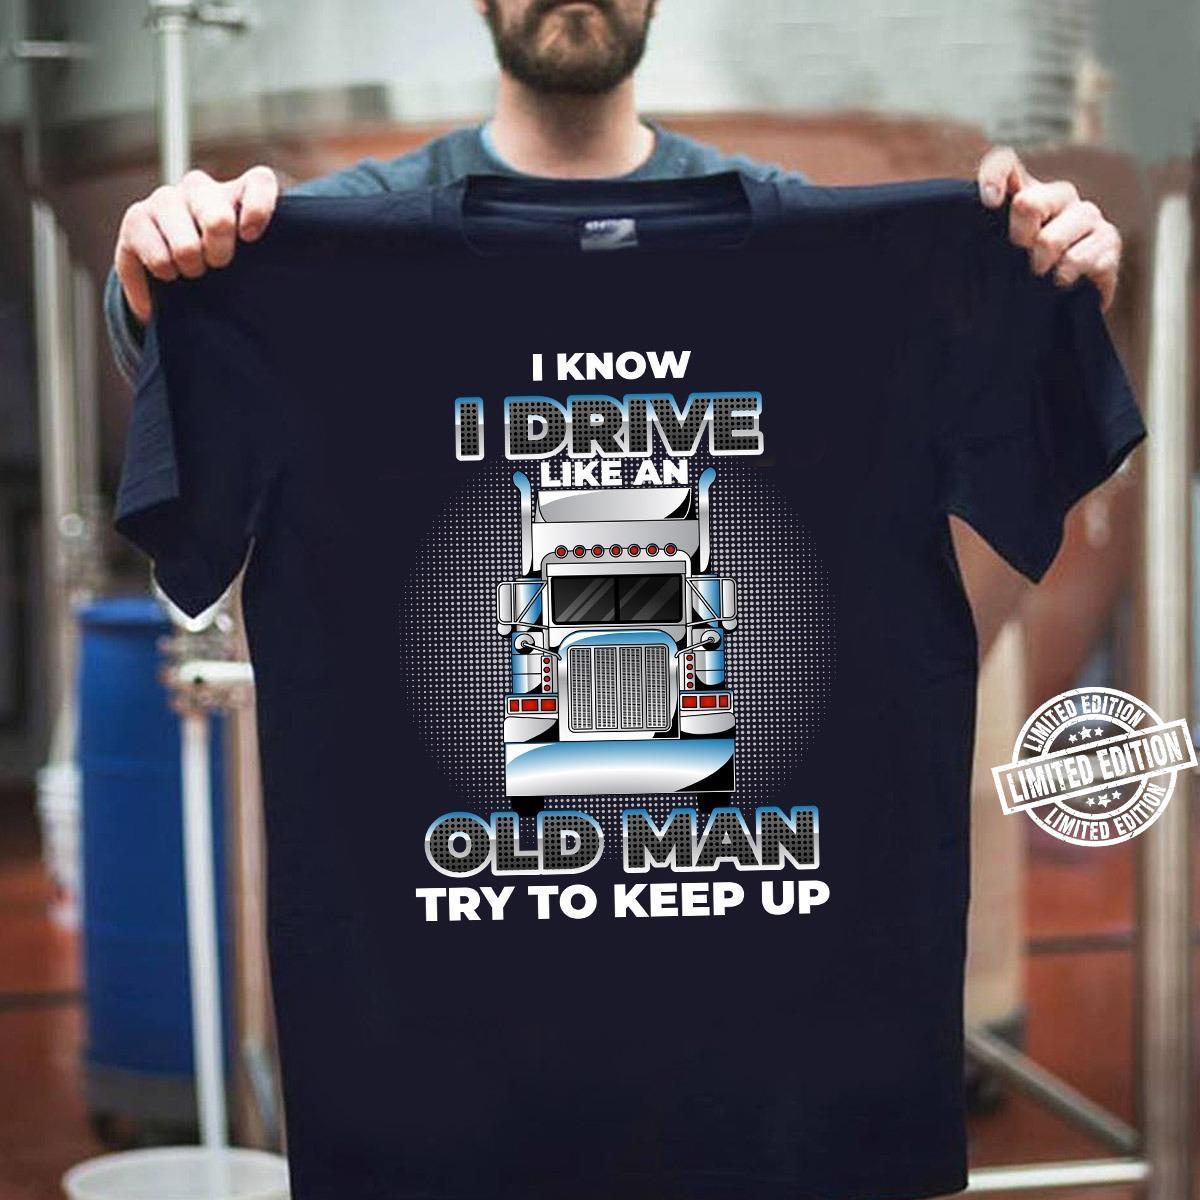 I know i drive like an old man try to keep up shirt